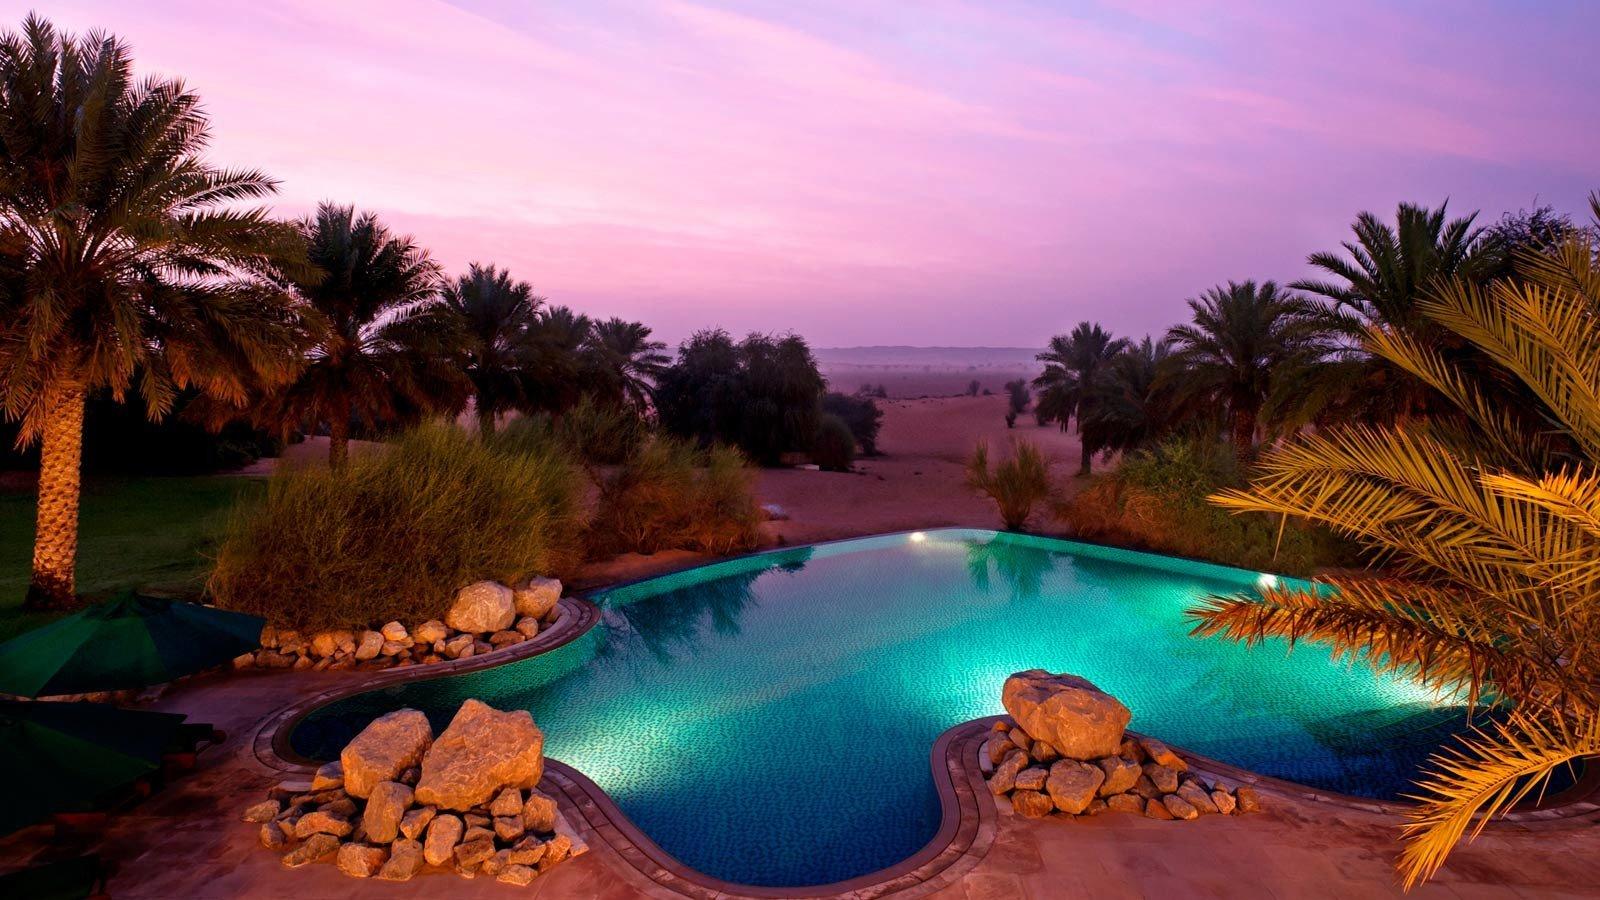 Nature swimming pool tropics Resort water sky palm tree arecales landscape caribbean tree computer wallpaper evening